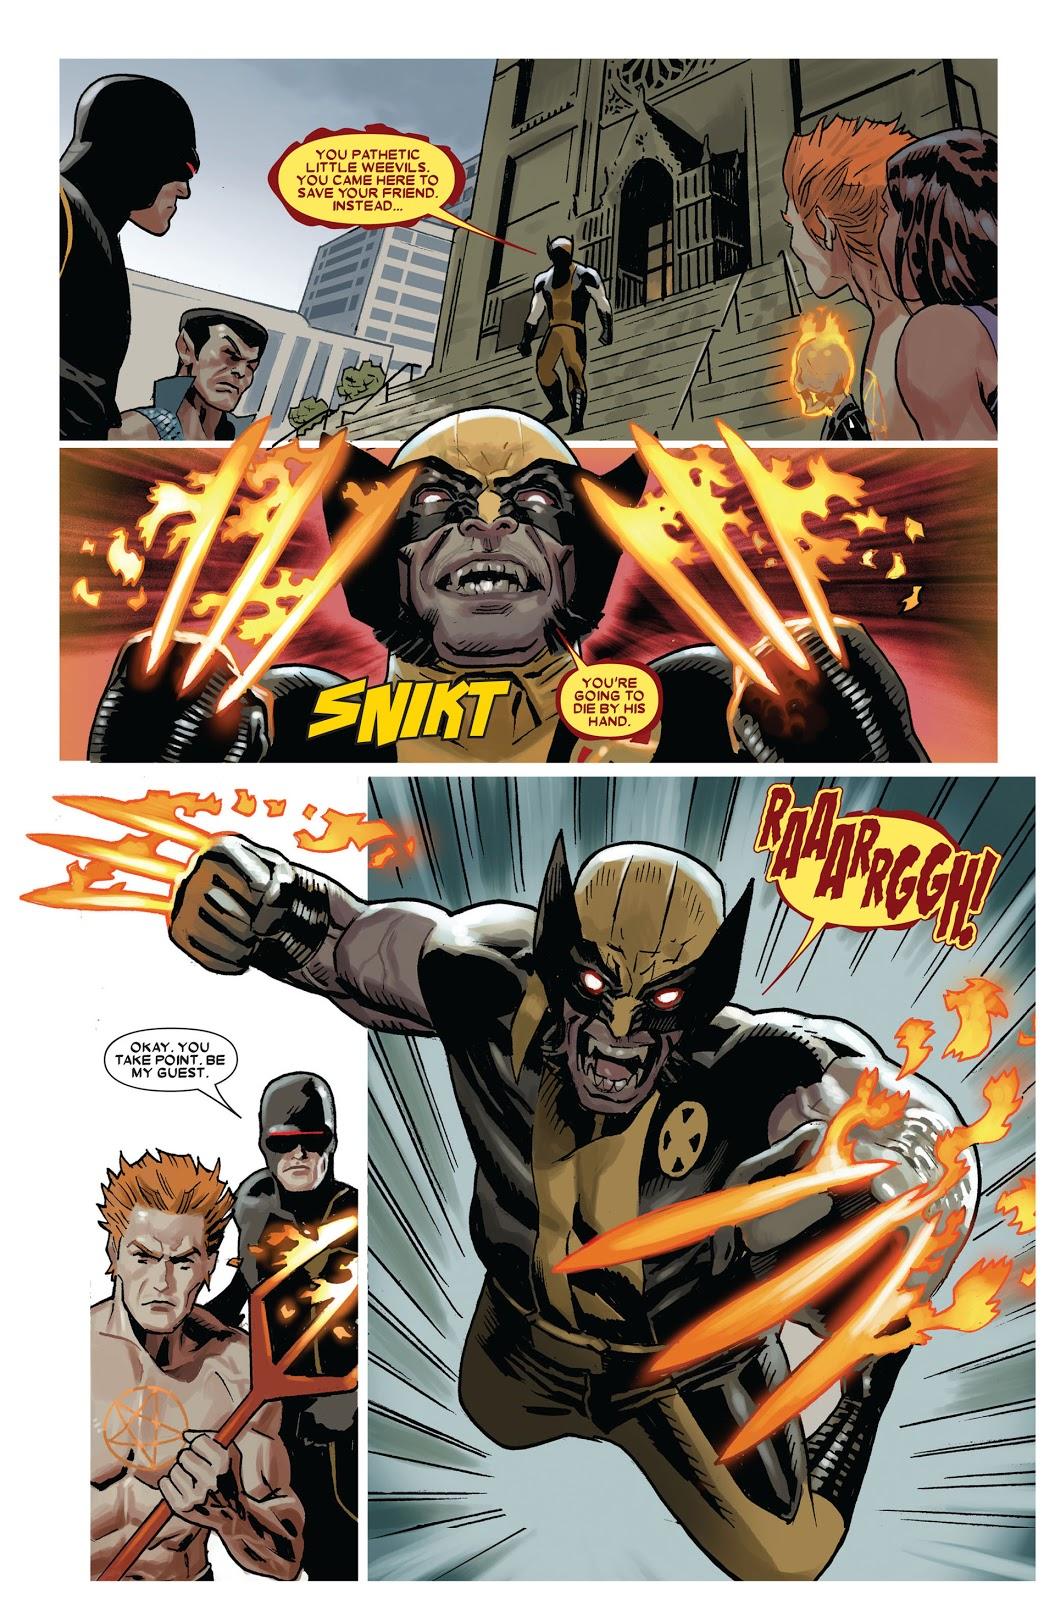 Wolverine vs the X-Men review